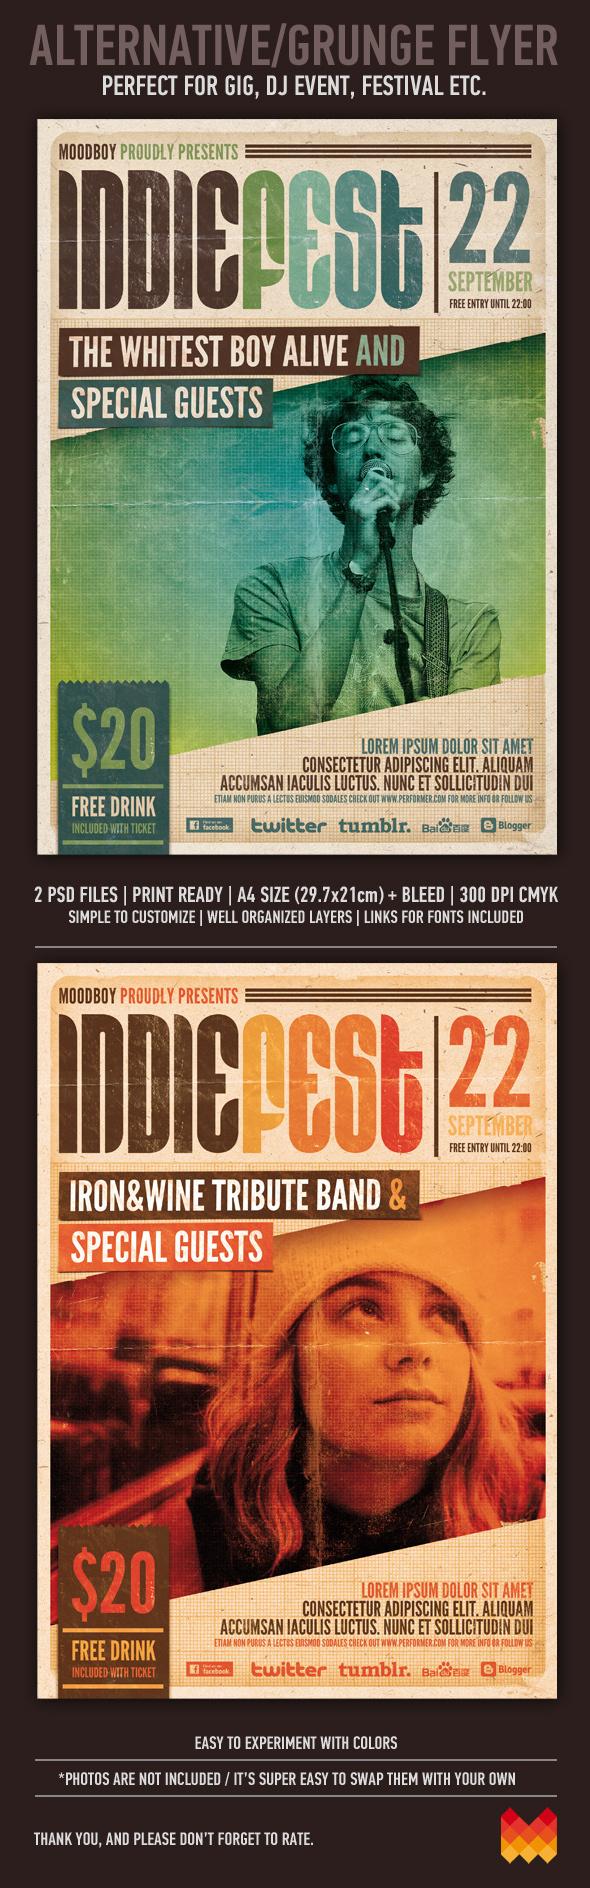 Indie Fest Poster PSD (Hi Res) on Behance #alternative #indie #concert #poster